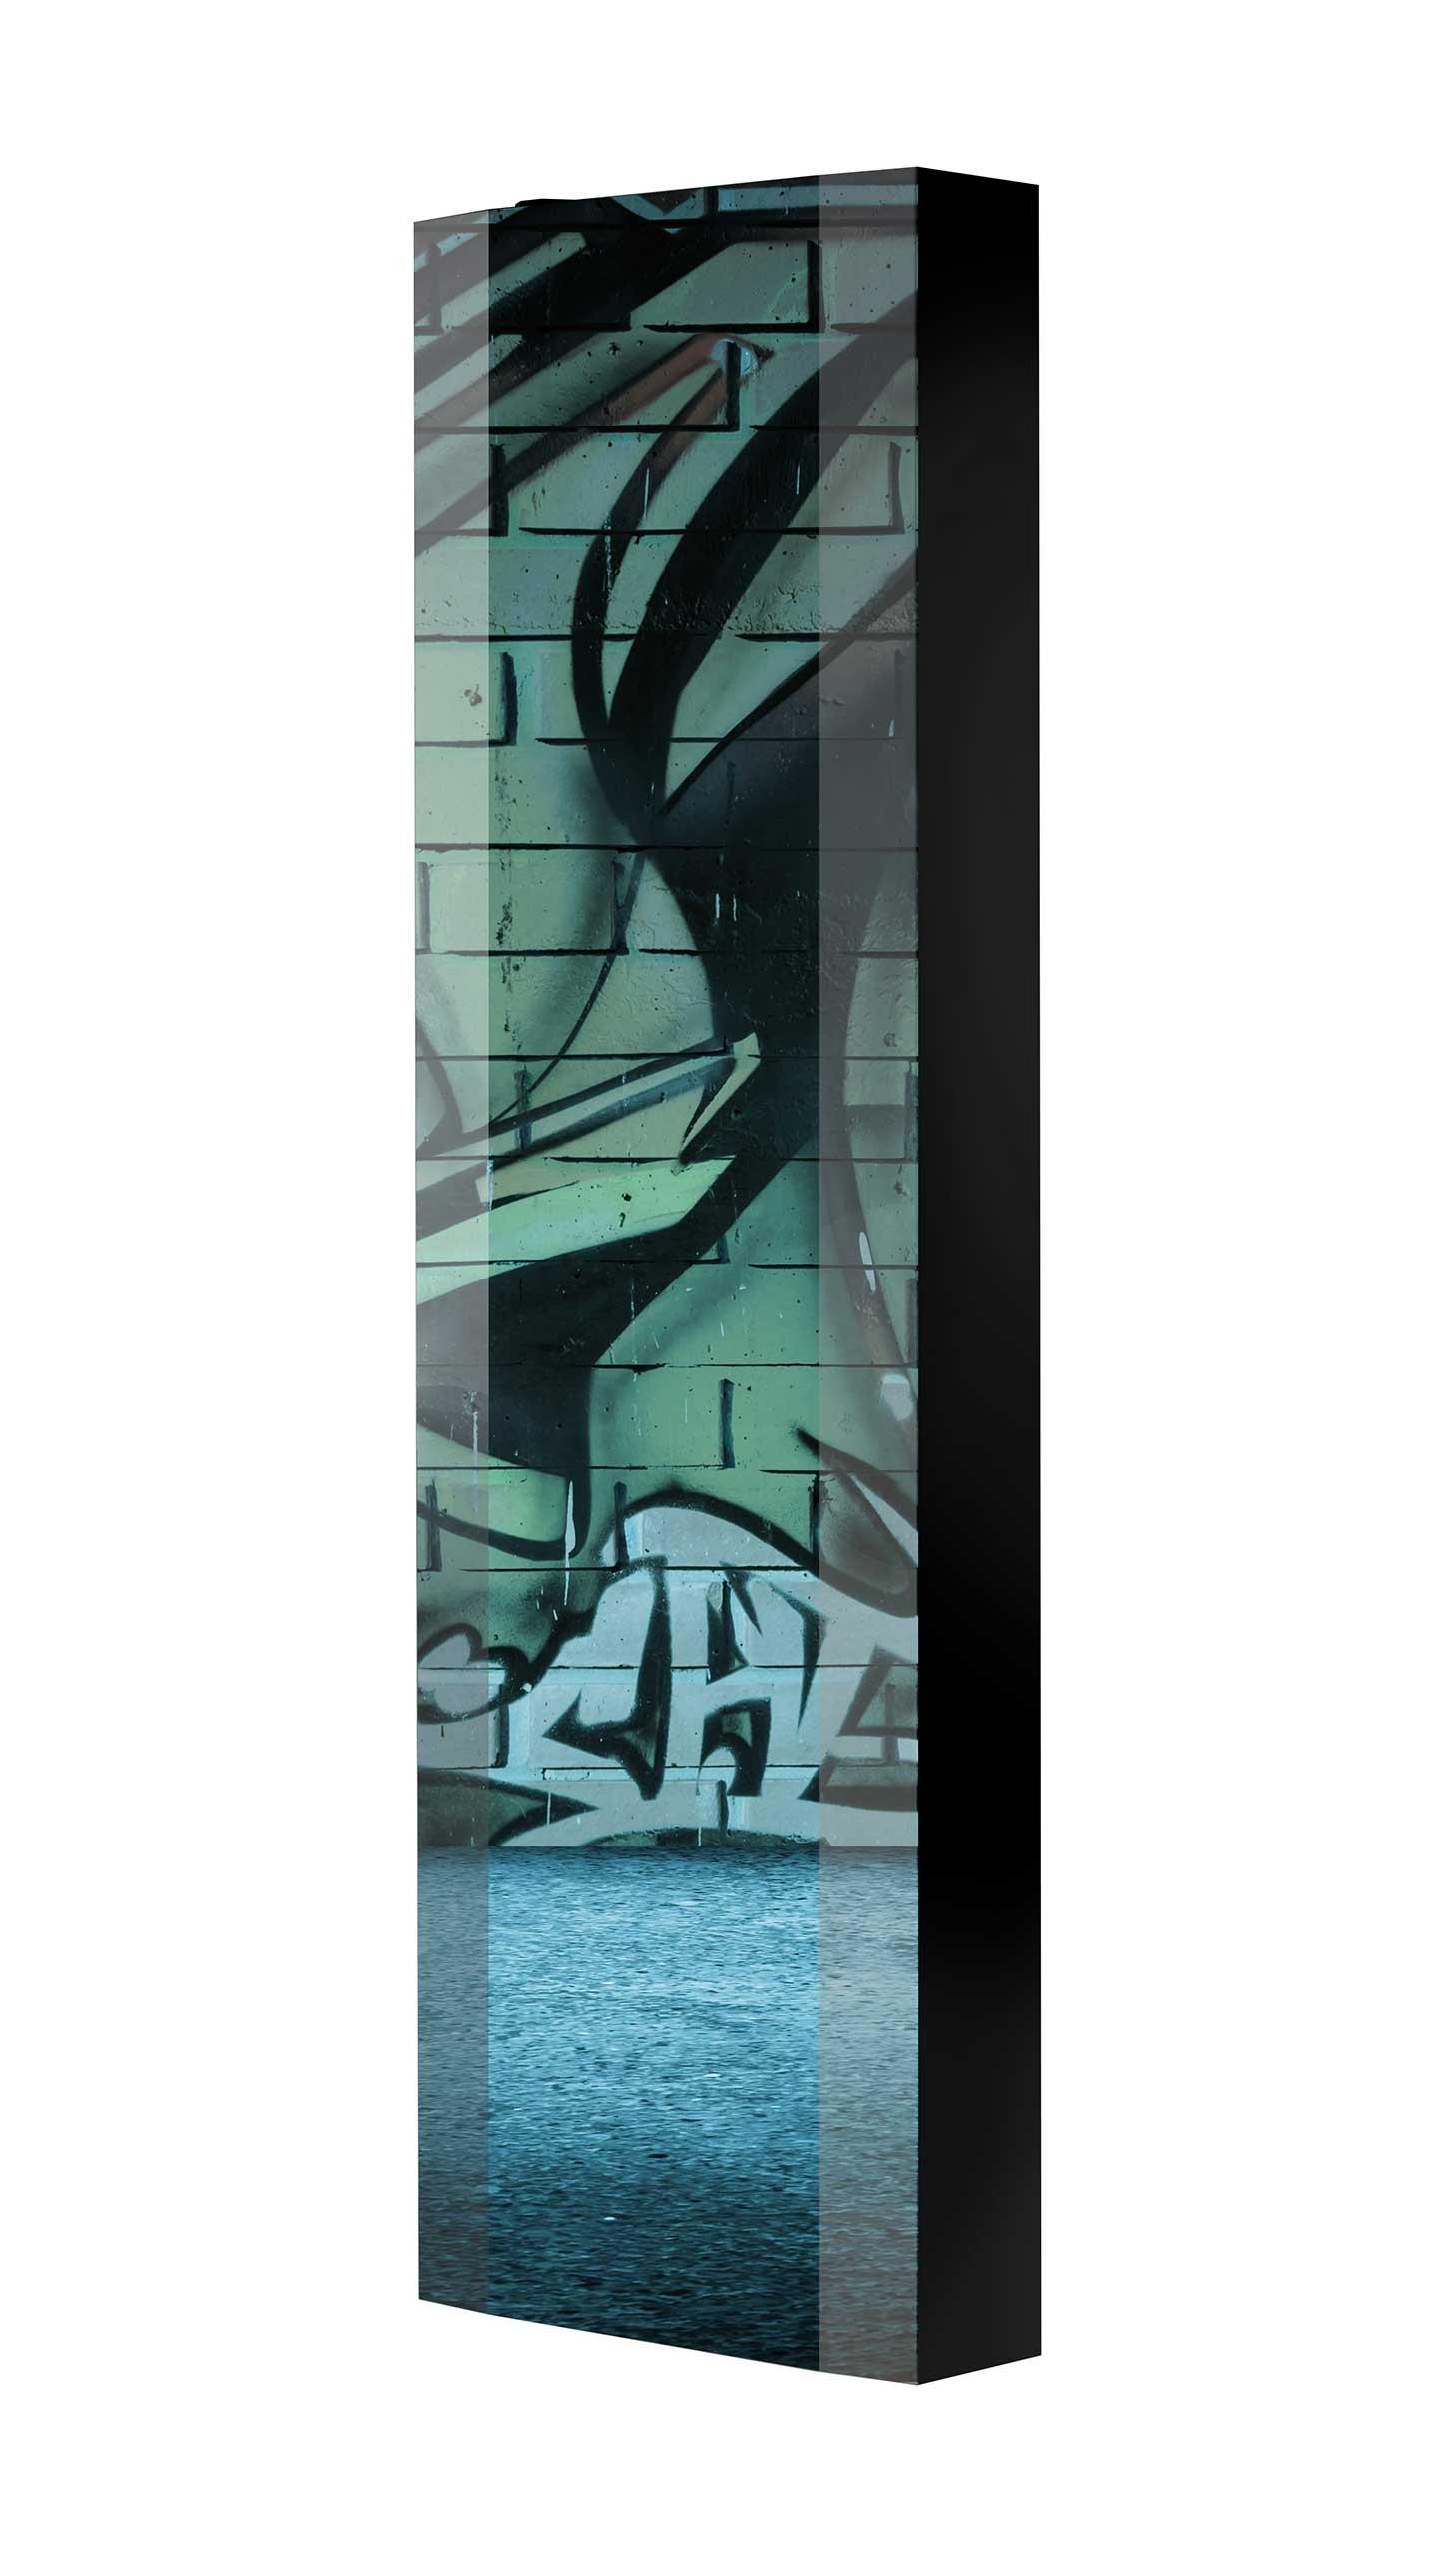 Schuhschrank FLASH 450 BLACK-EDITION Motivschrank schwarz drehbar M37 Graffiti